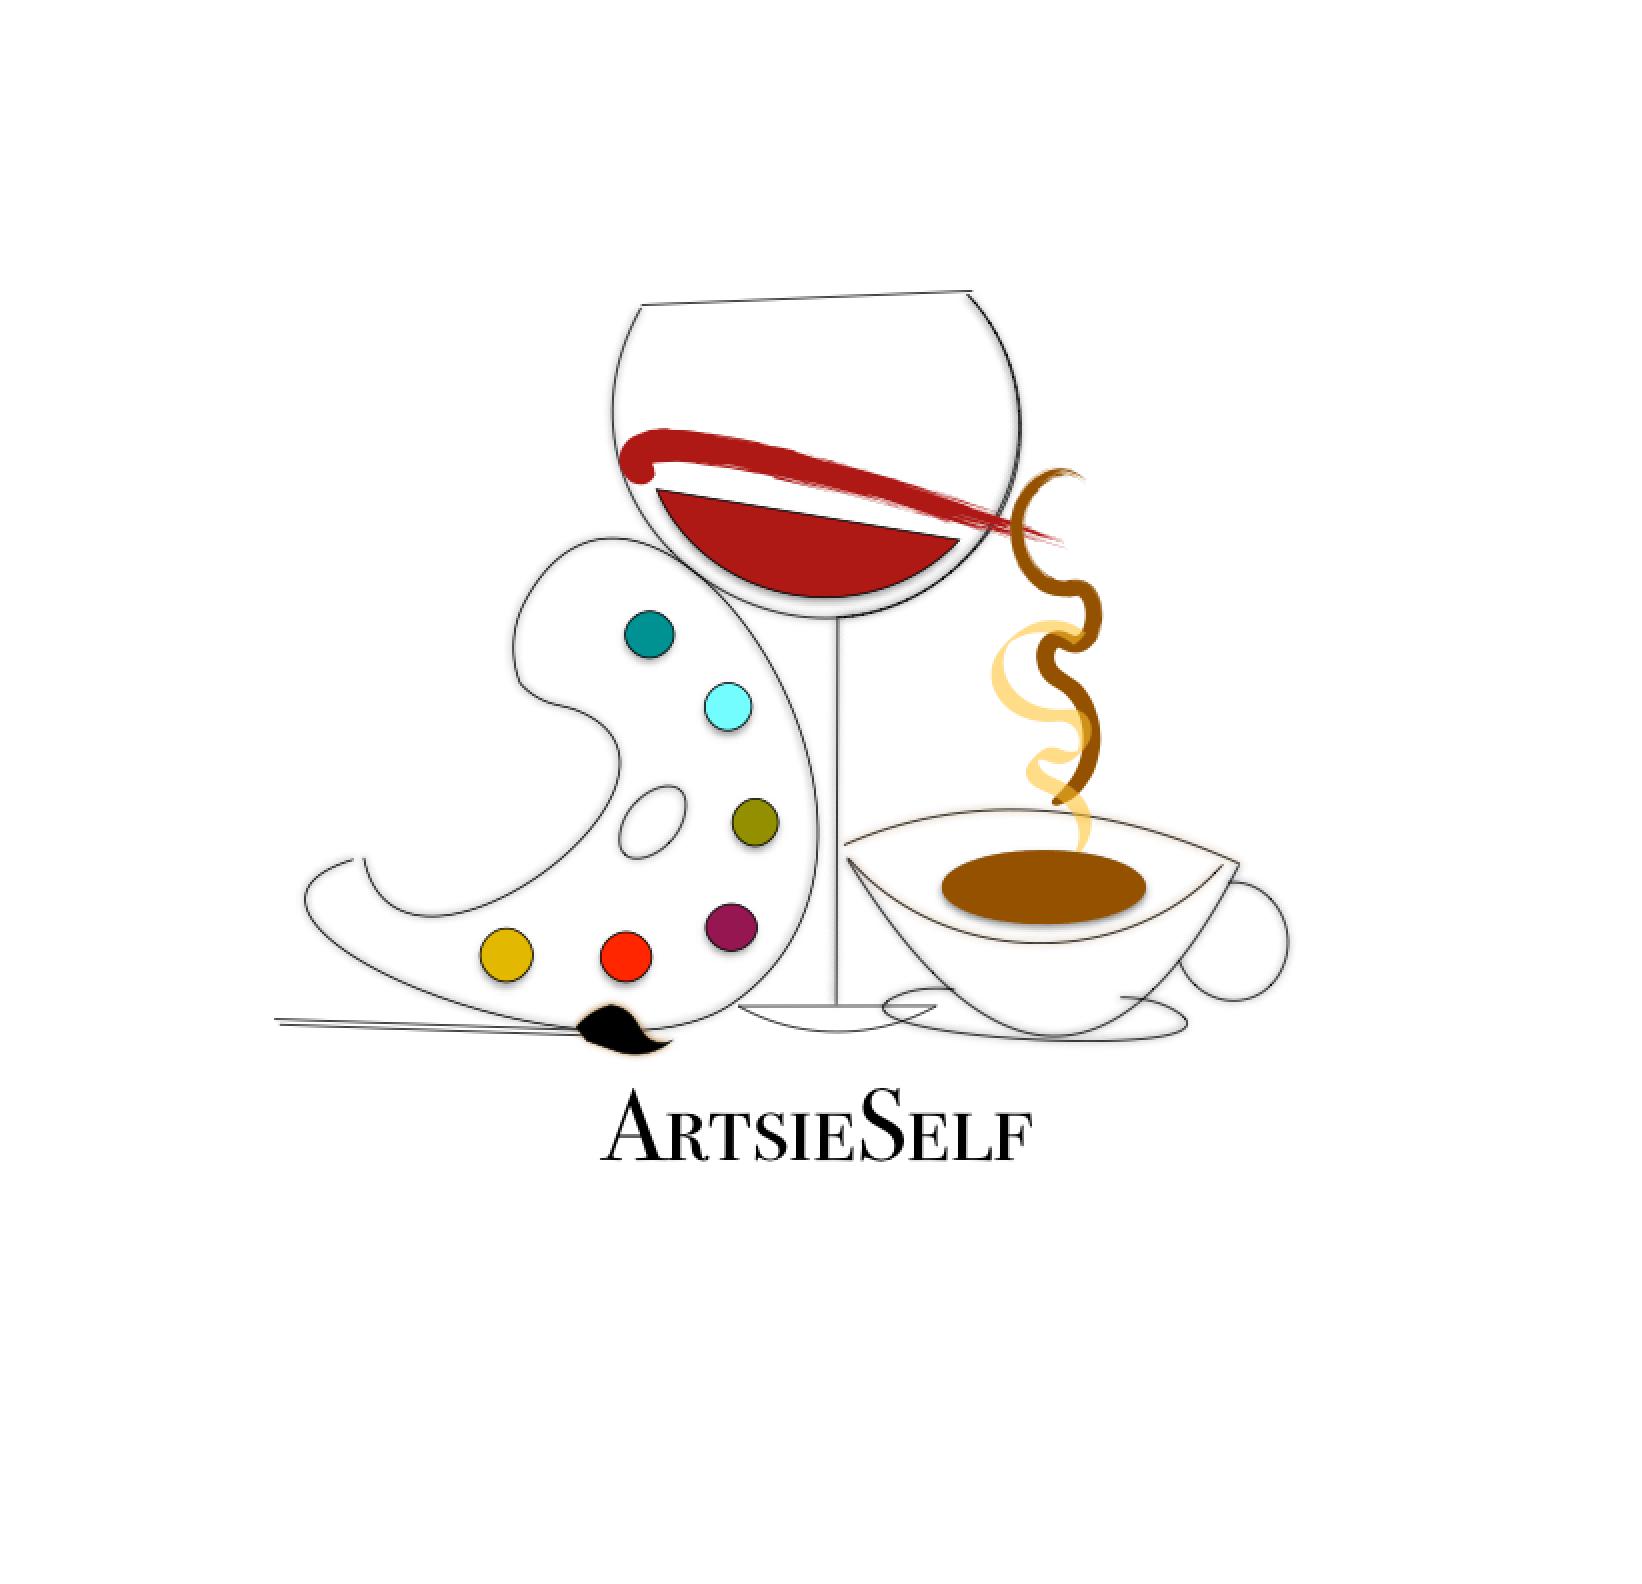 ArtsieSelf, LLC